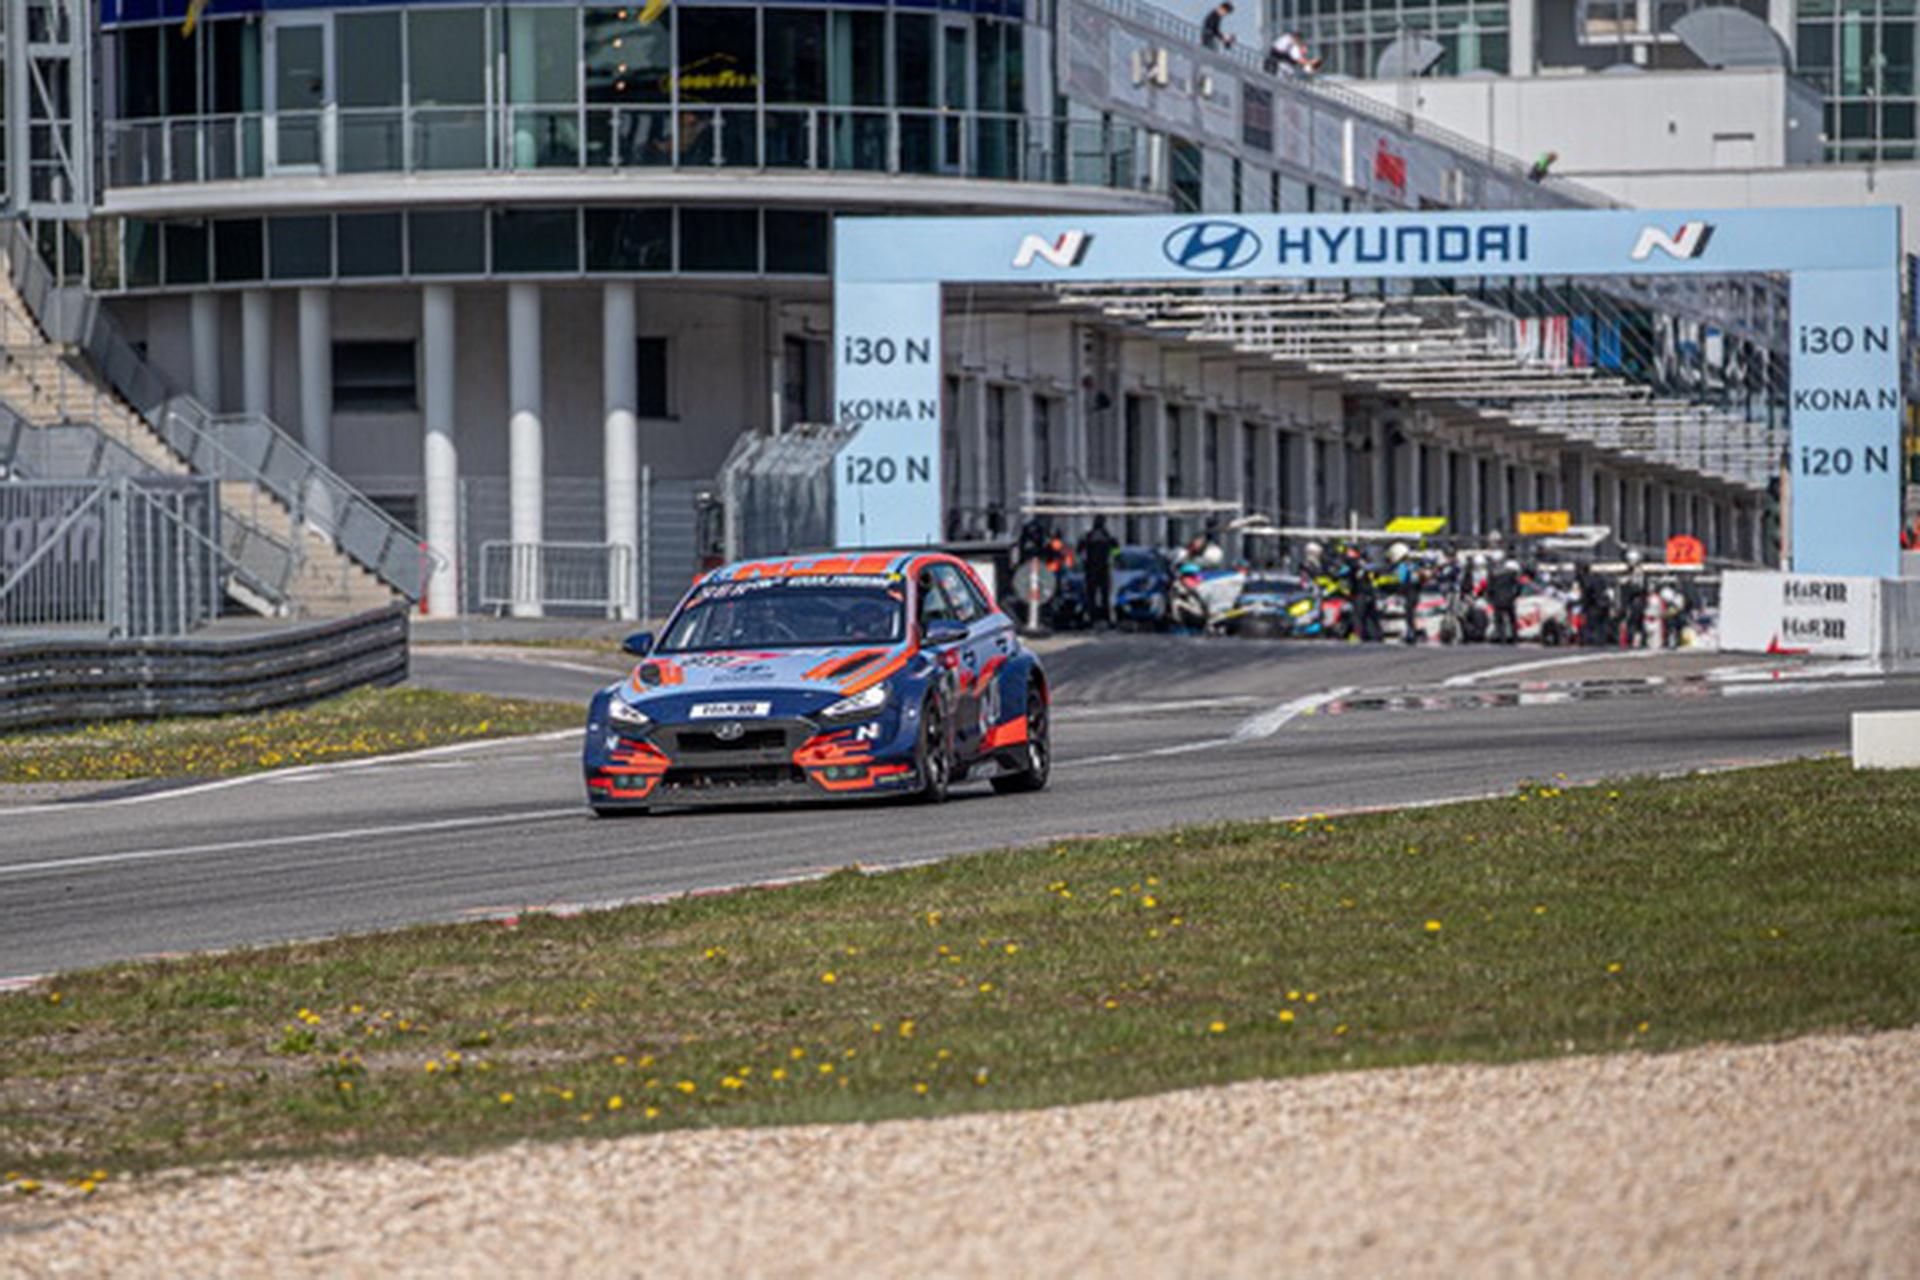 Hyundai Motor выставит на гонку «24 часа Нюрбургринга» сразу три модели